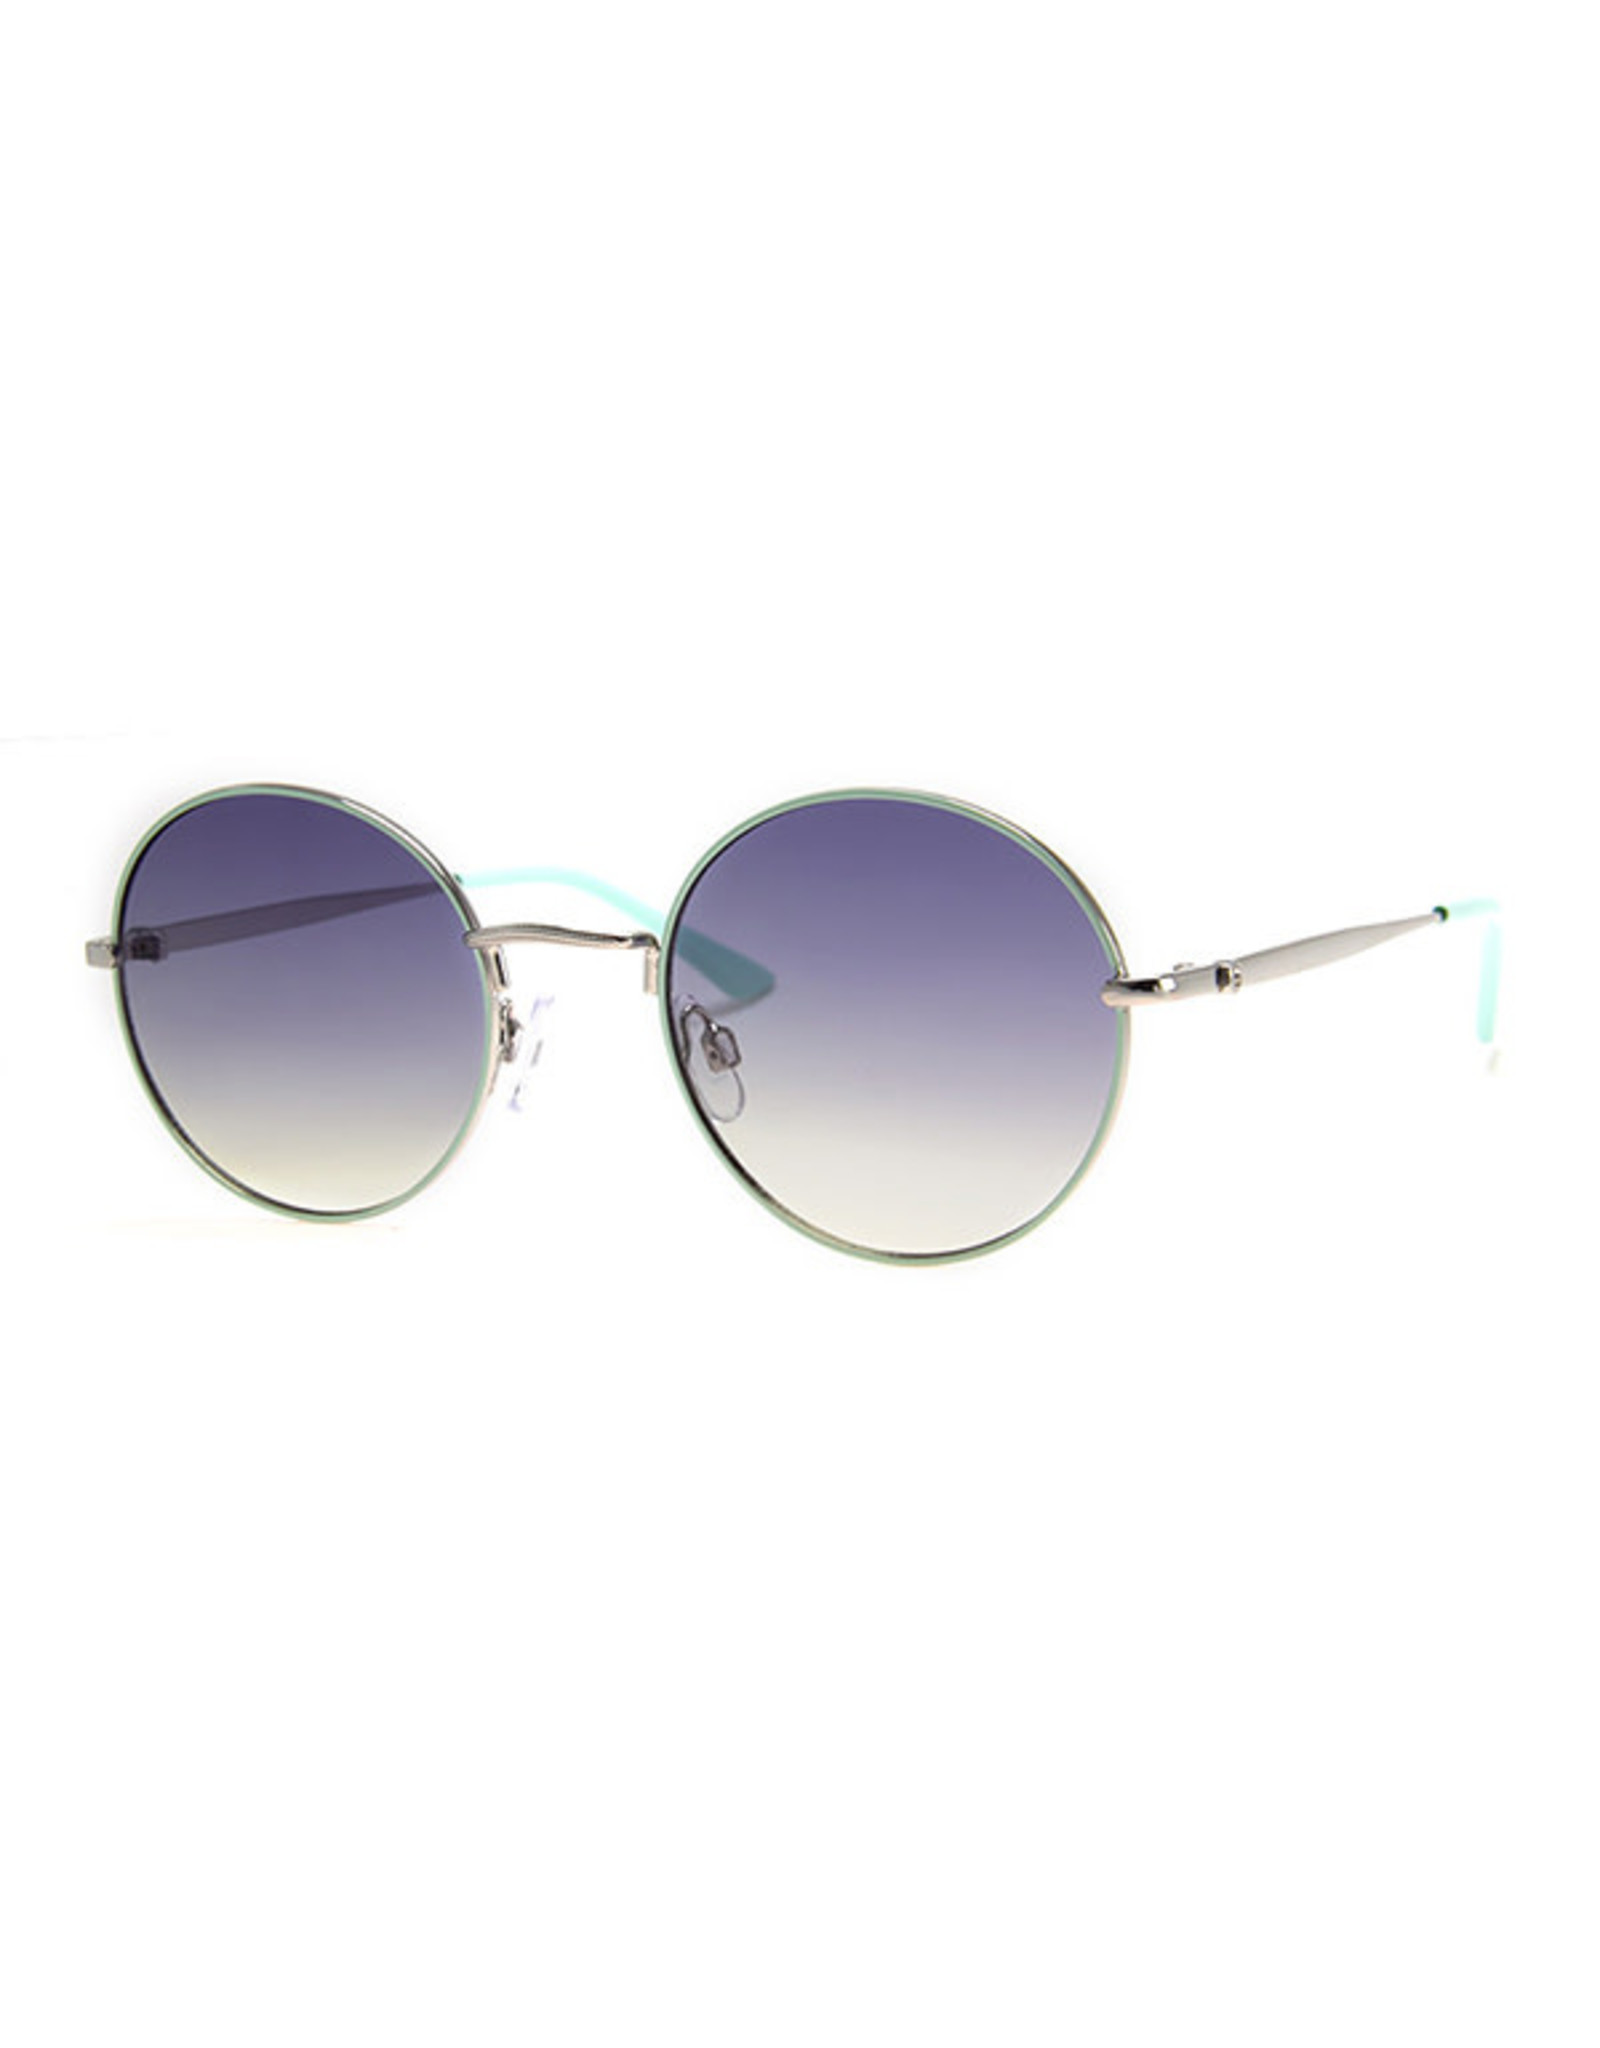 AJM - Round Colored Wire Frame Sunglasses